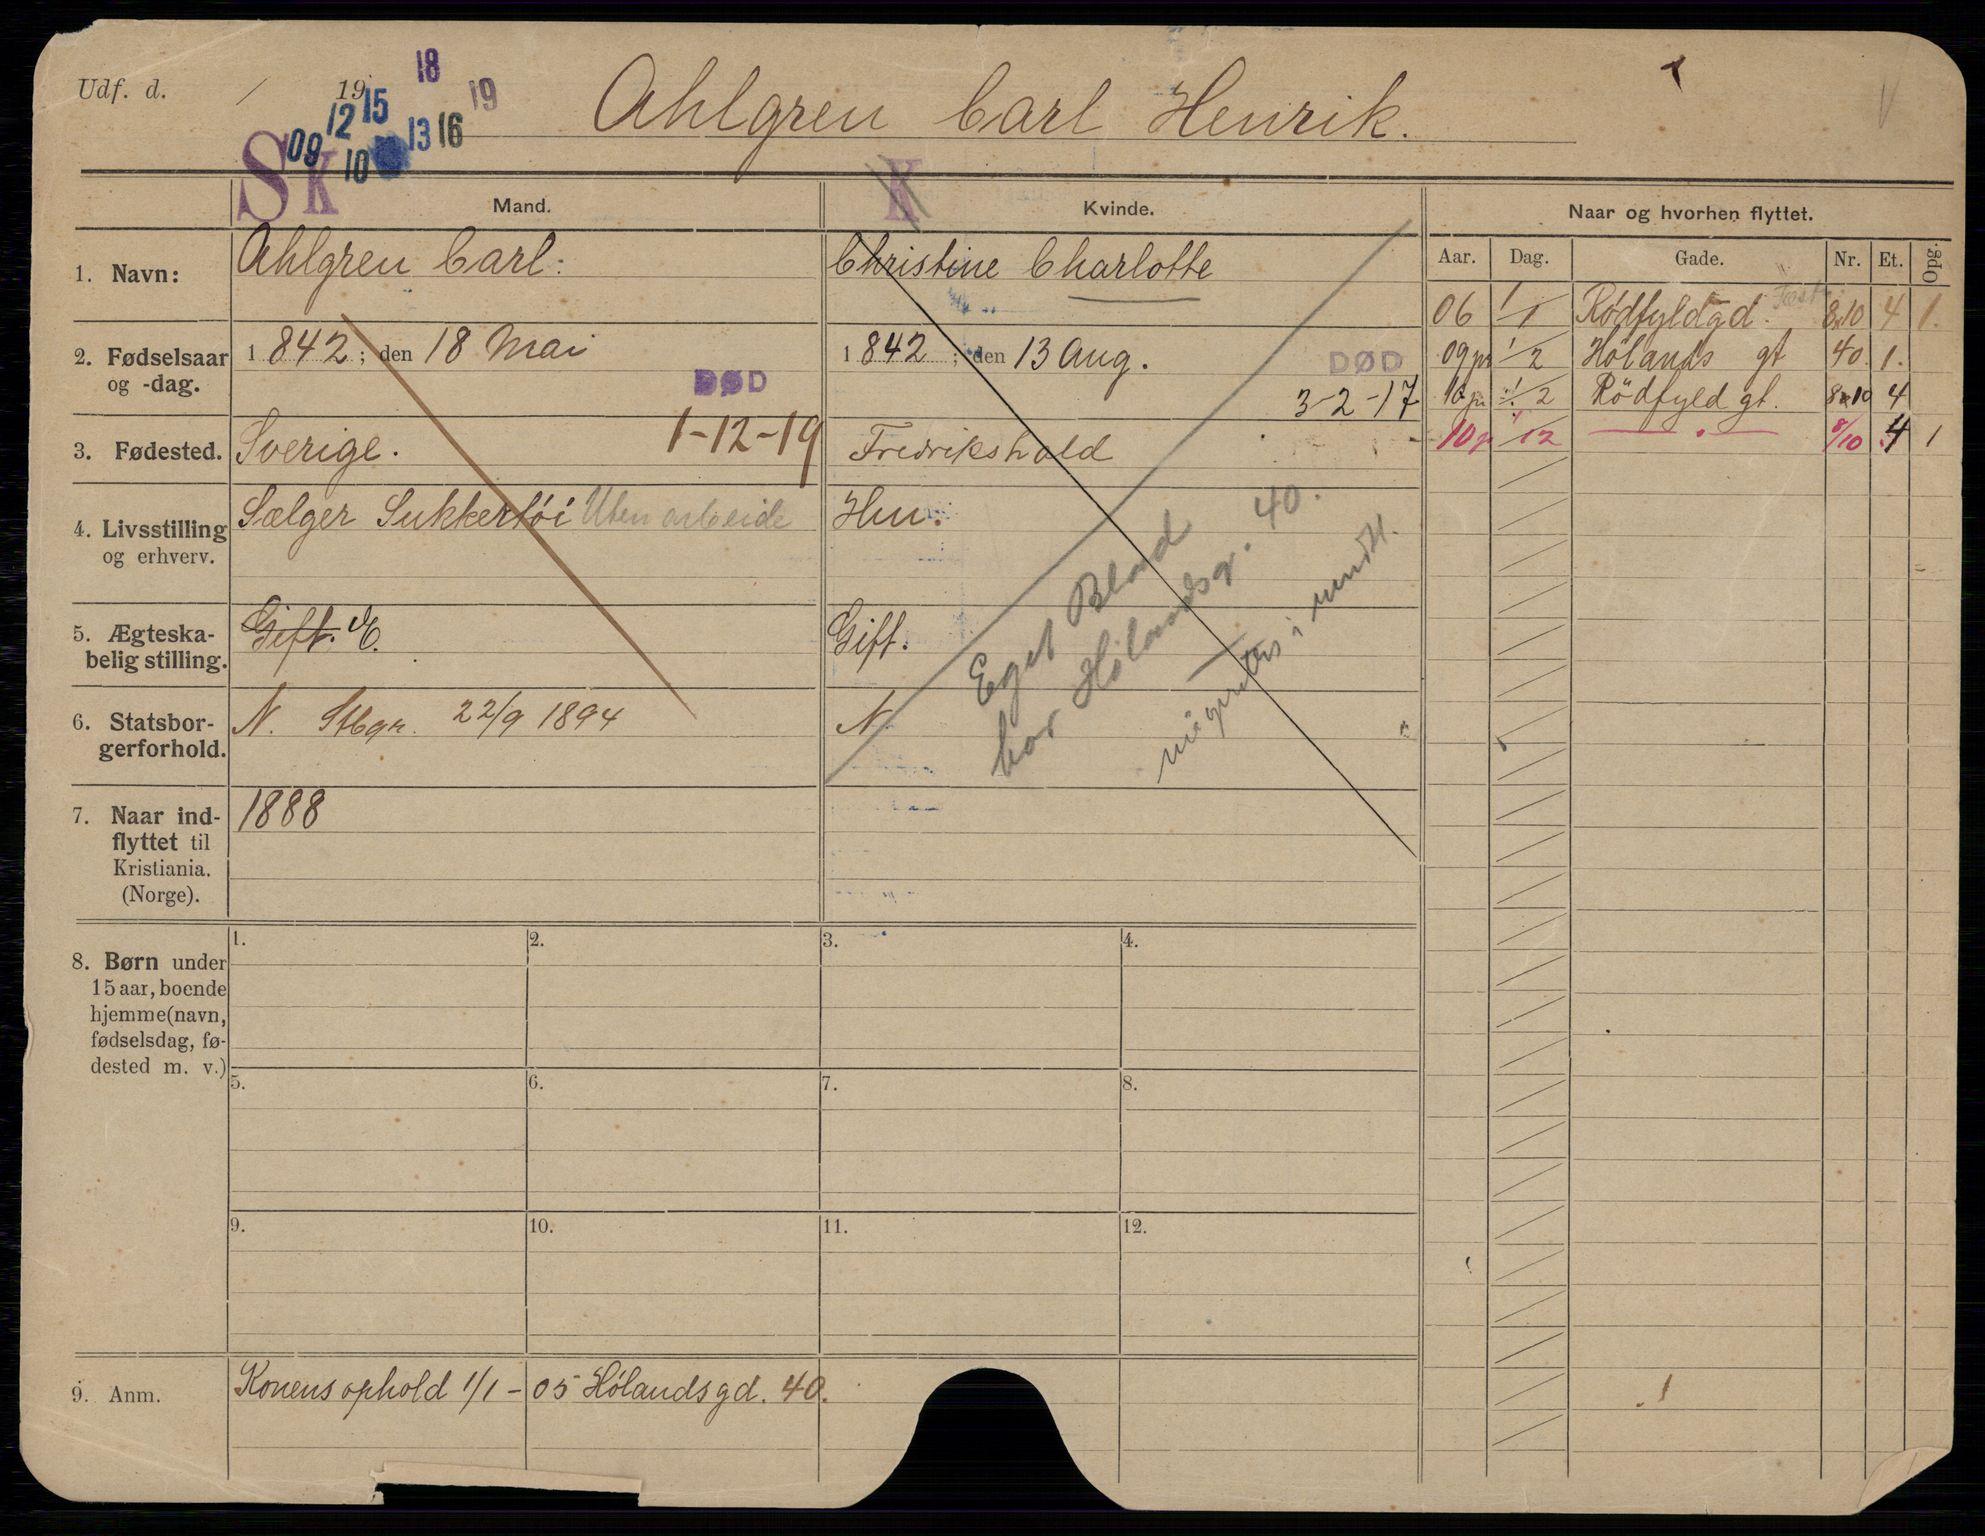 SAO, Oslo folkeregister, Registerkort, G/Gb/L0028: Menn, 1919